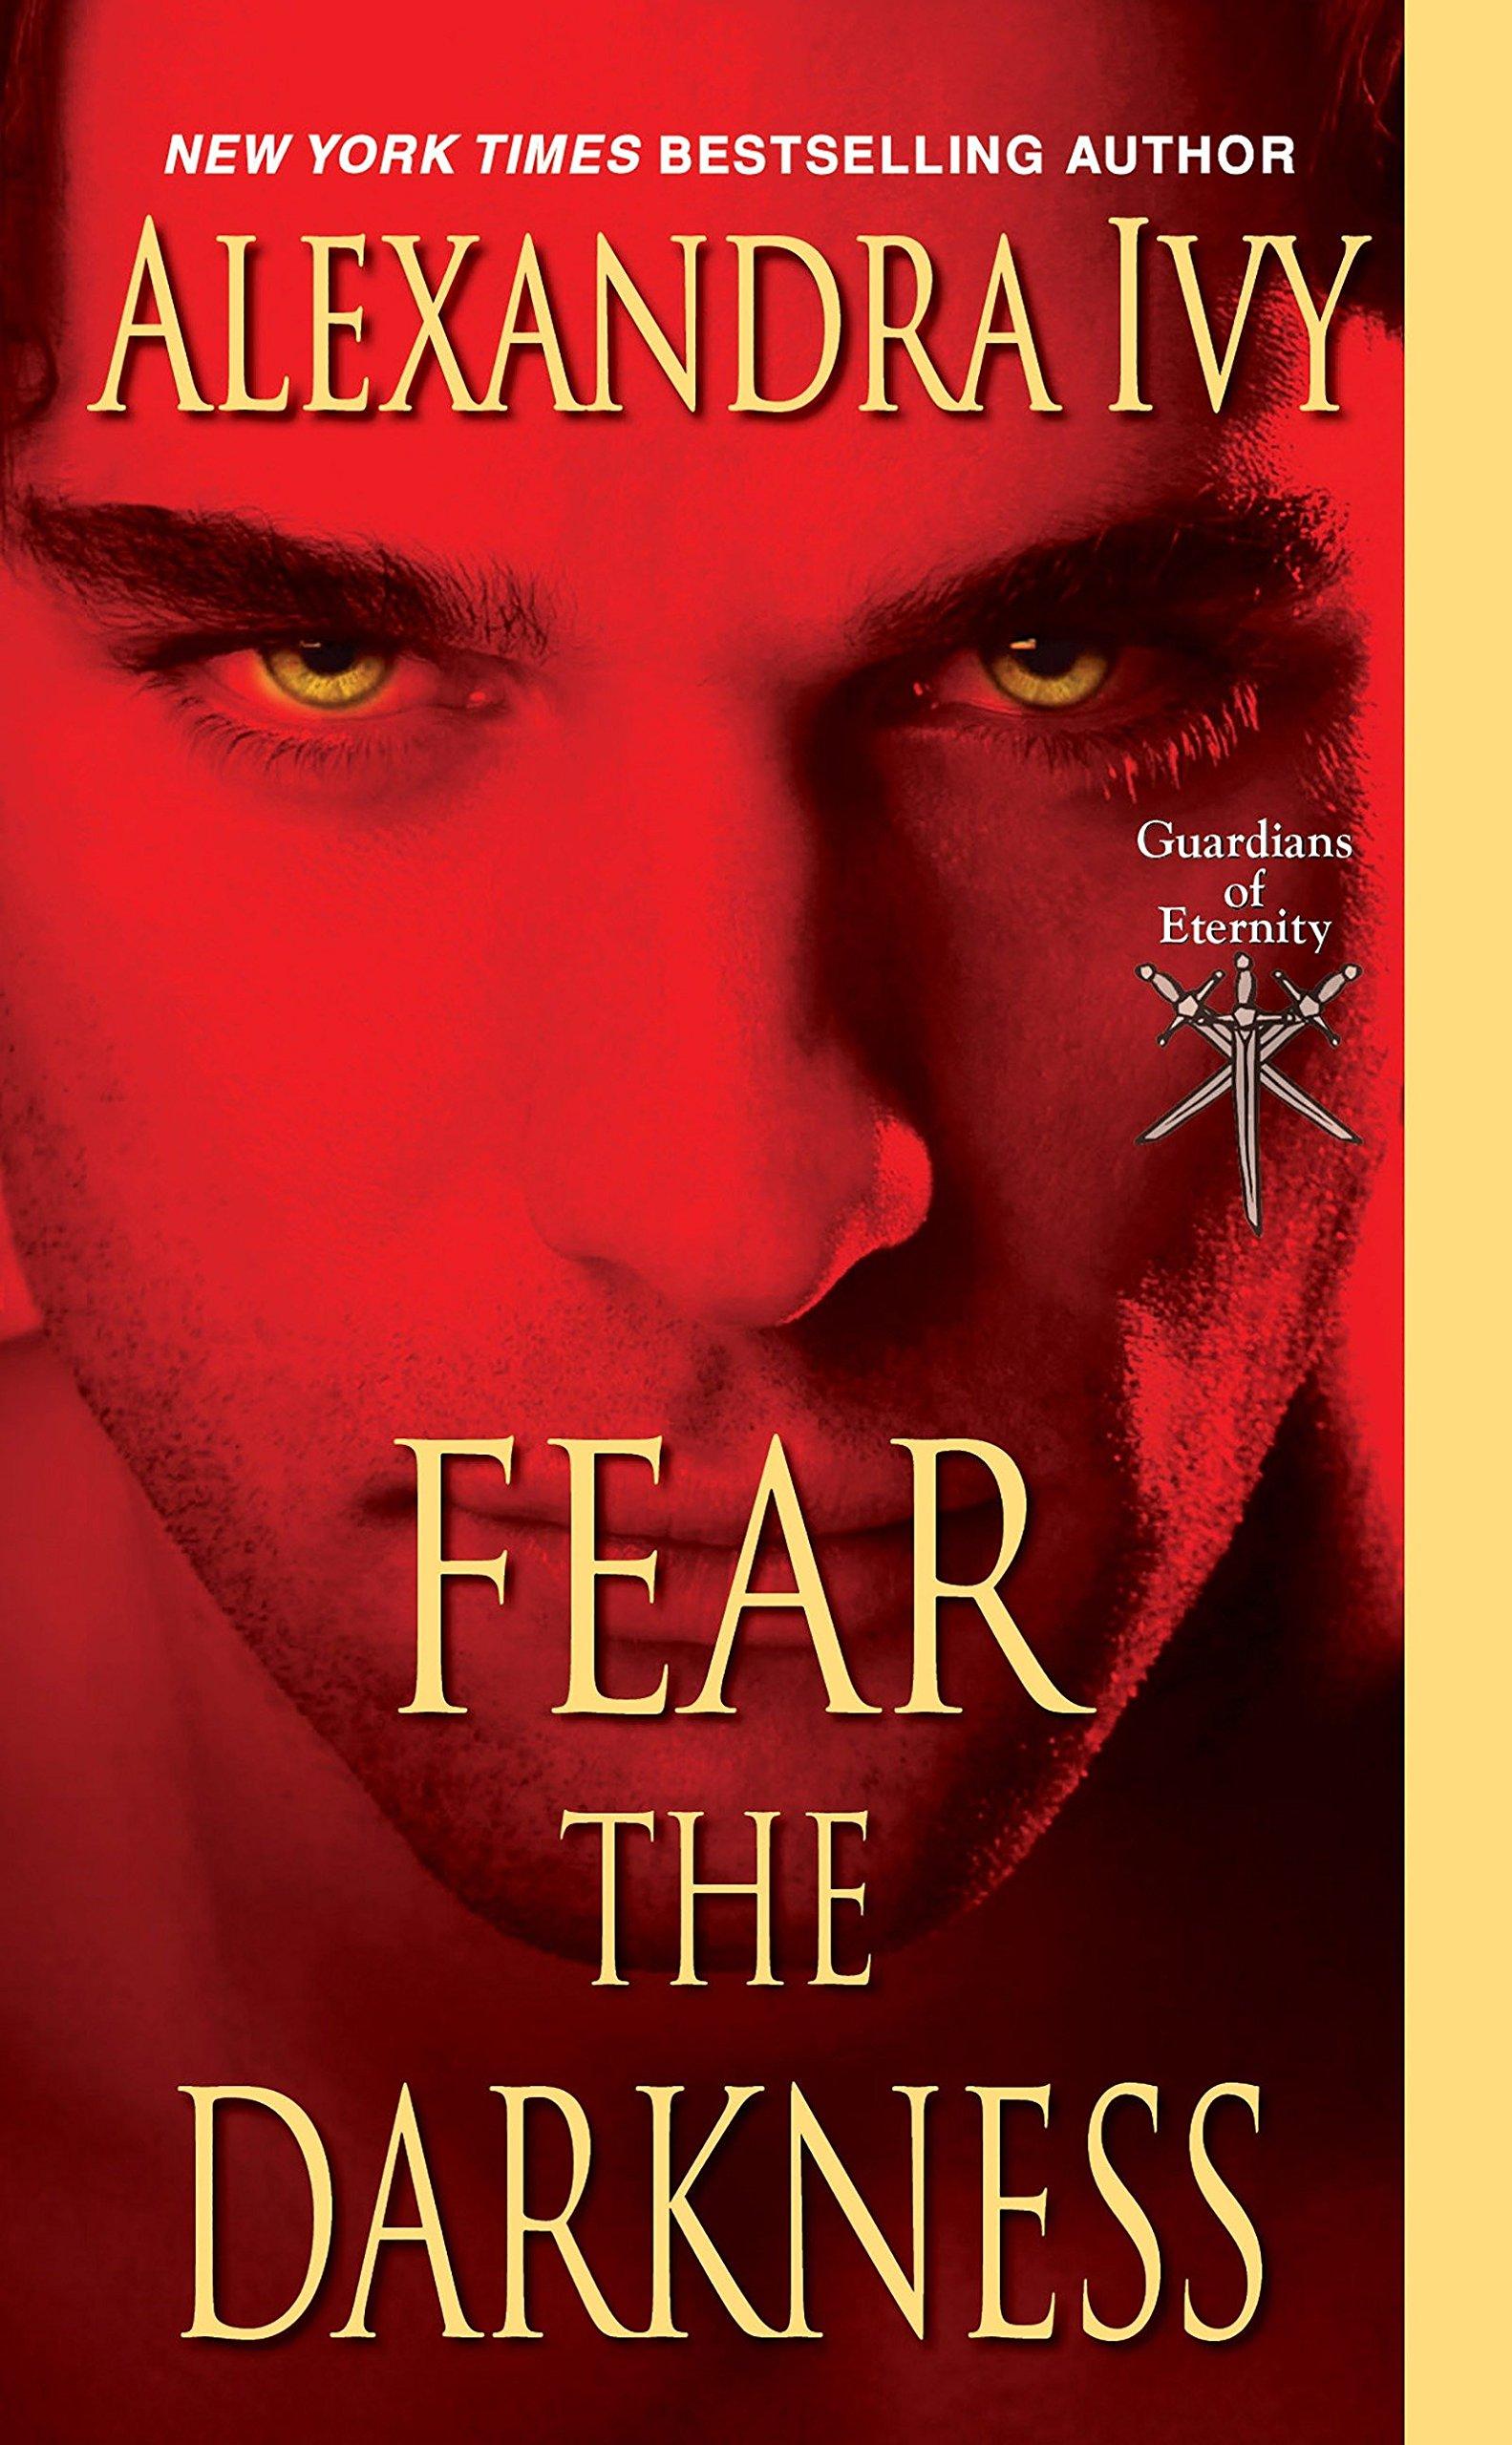 Read Online Fear The Darkness (Guardians Of Eternity) ebook